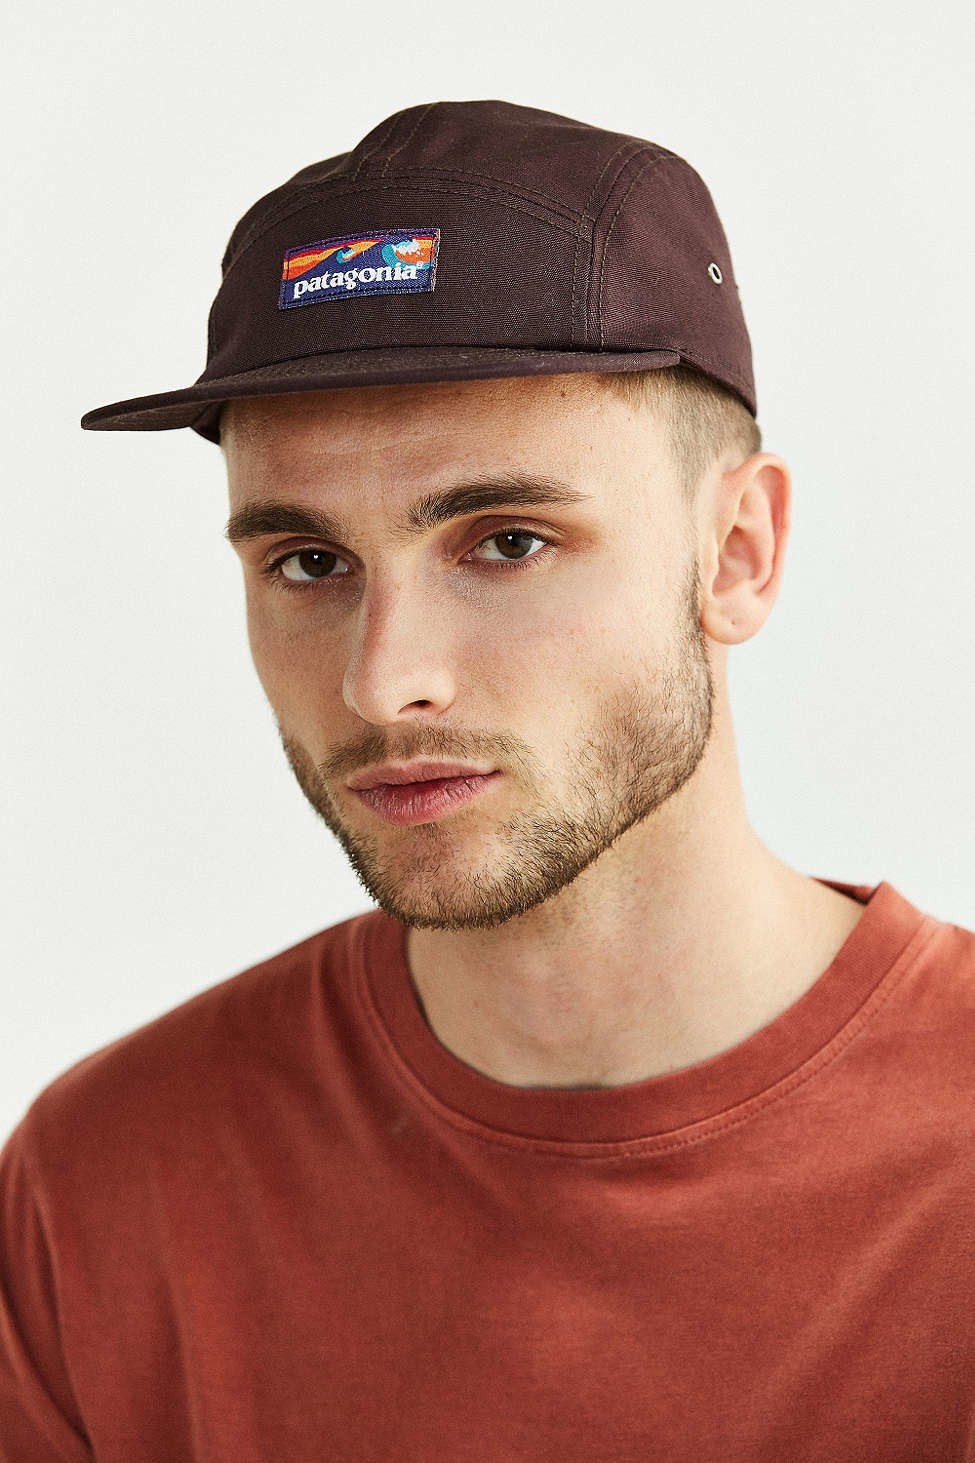 Lyst - Patagonia Boardshort Label Tradesmith Hat for Men 68b42c8e972